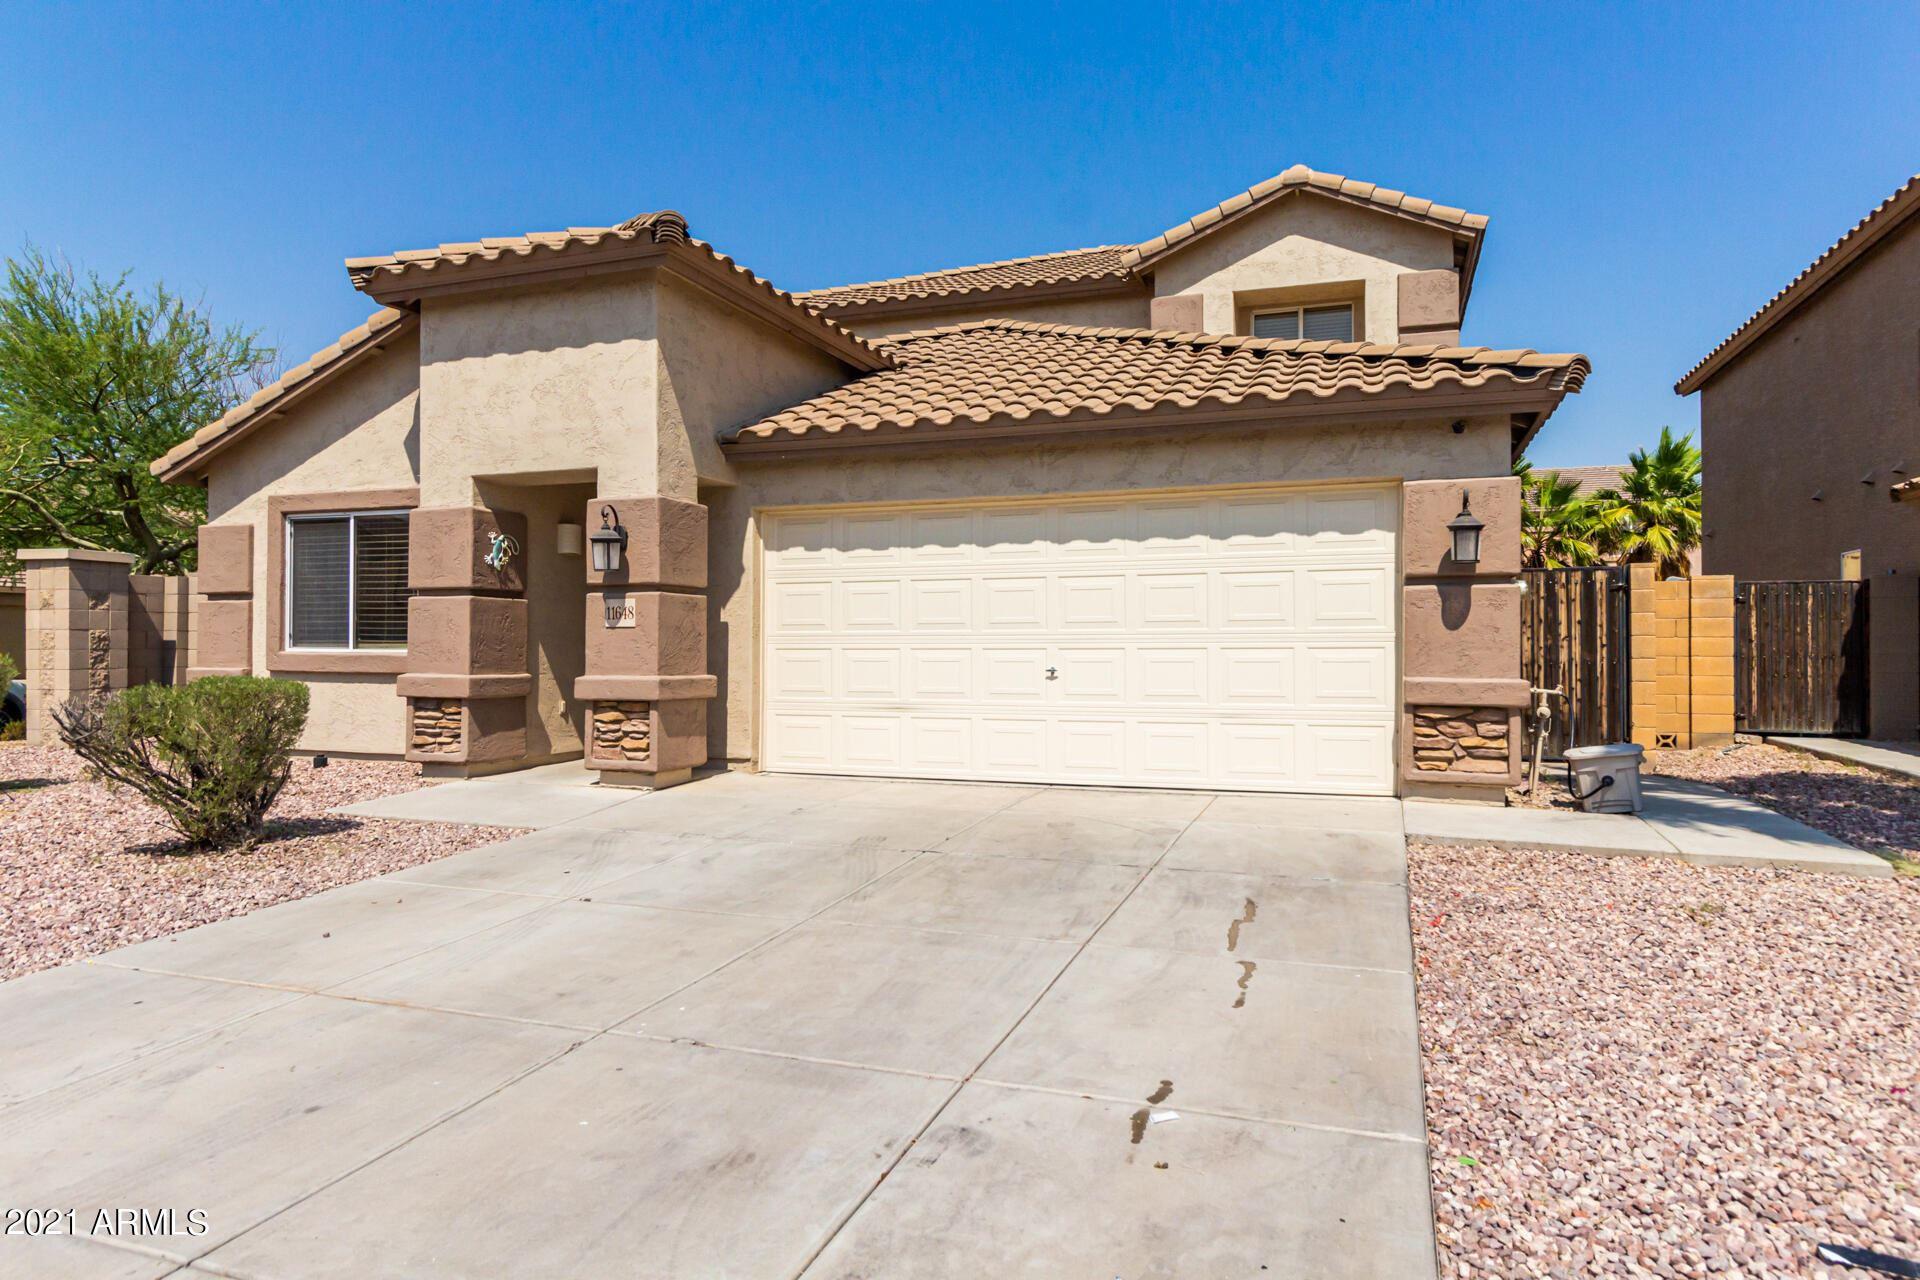 Photo of 11648 W LONGLEY Lane, Youngtown, AZ 85363 (MLS # 6294027)